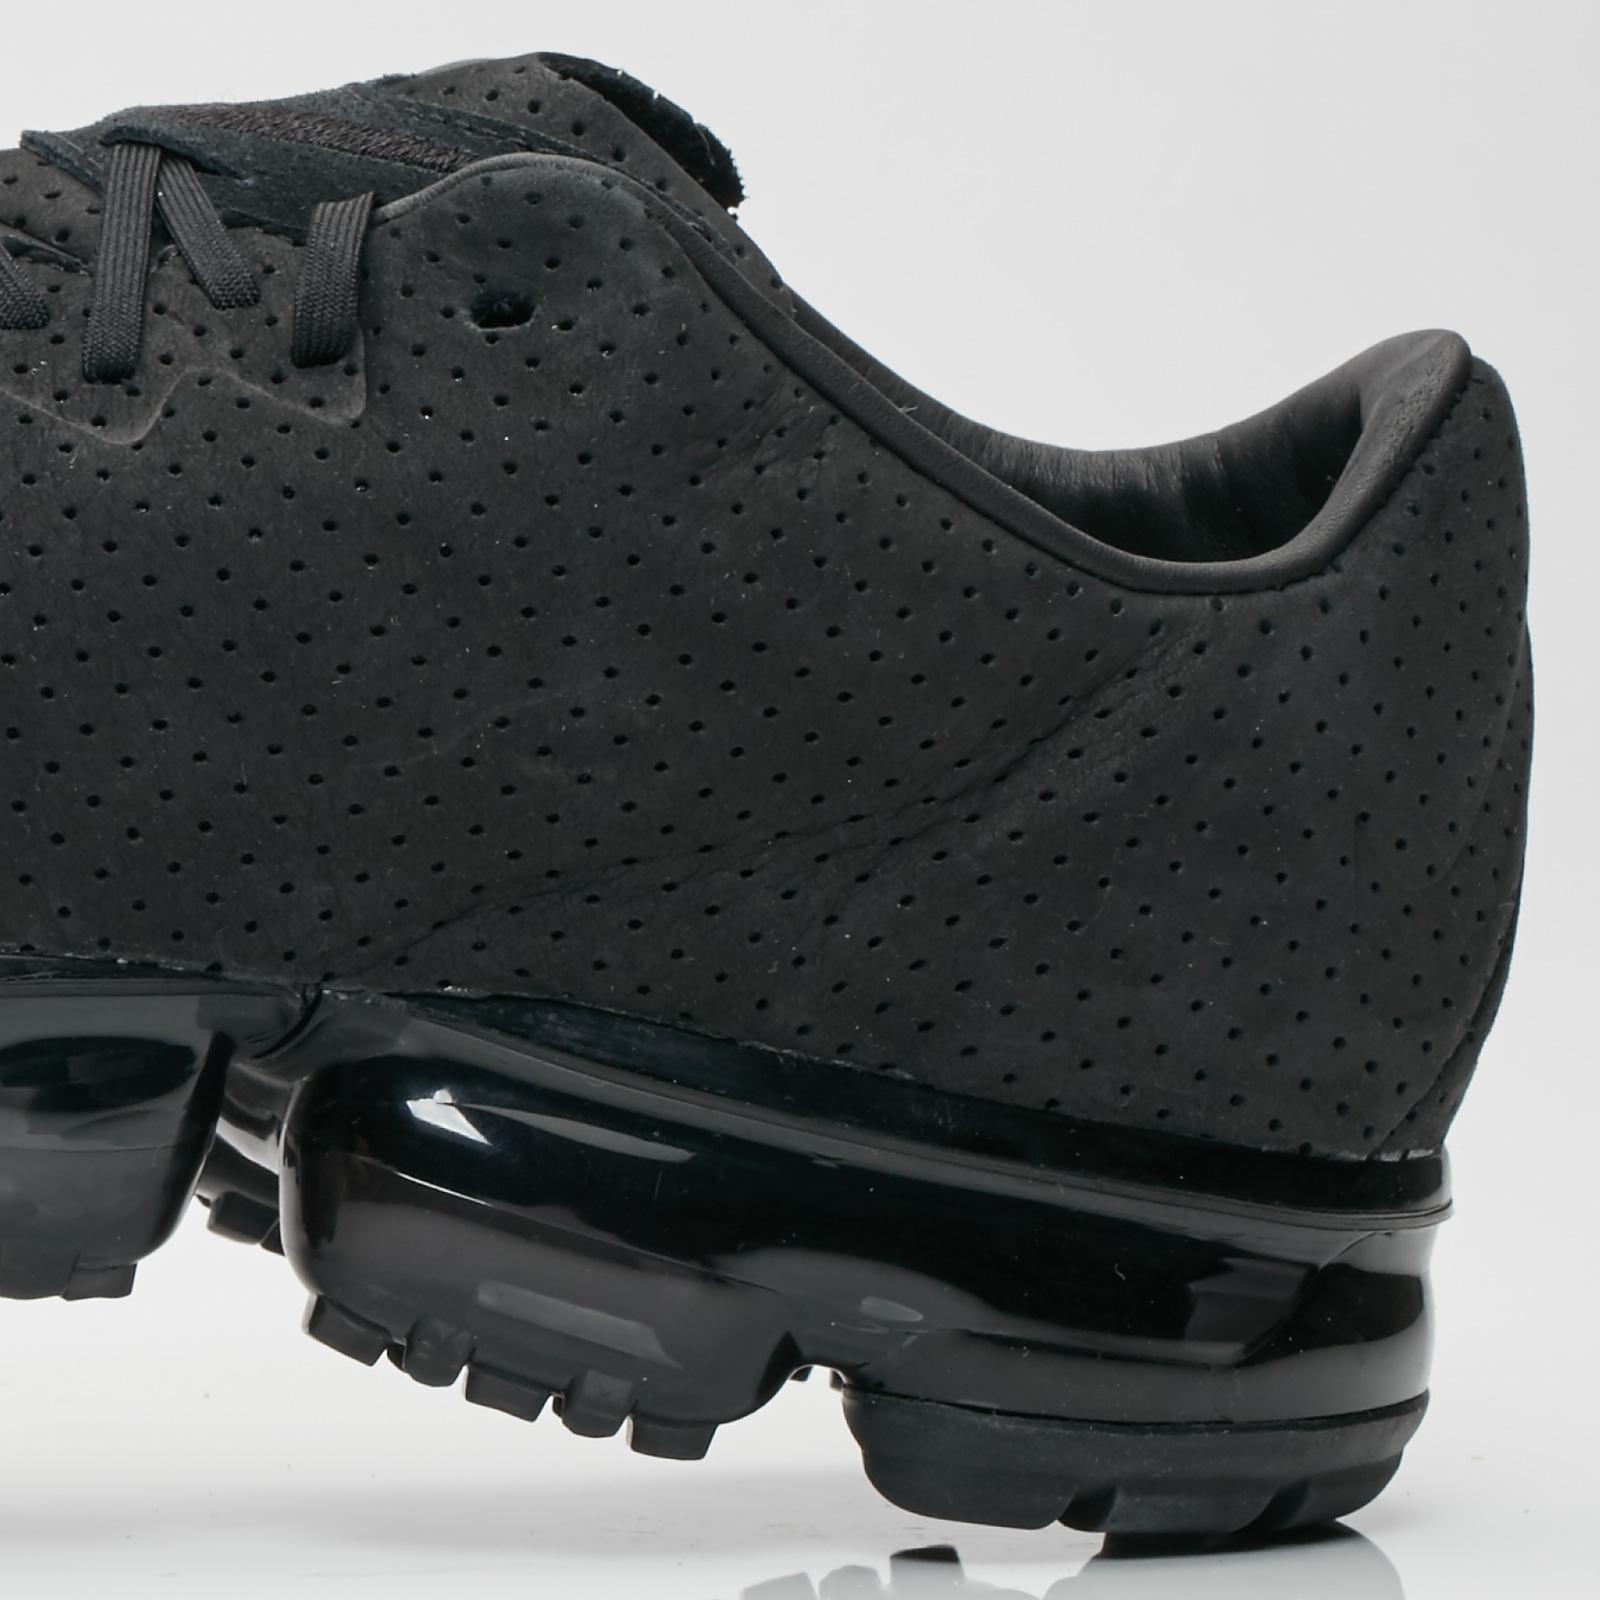 cde11f6eeeb55d Nike Air Vapormax LTR - Aj8287-001 - Sneakersnstuff